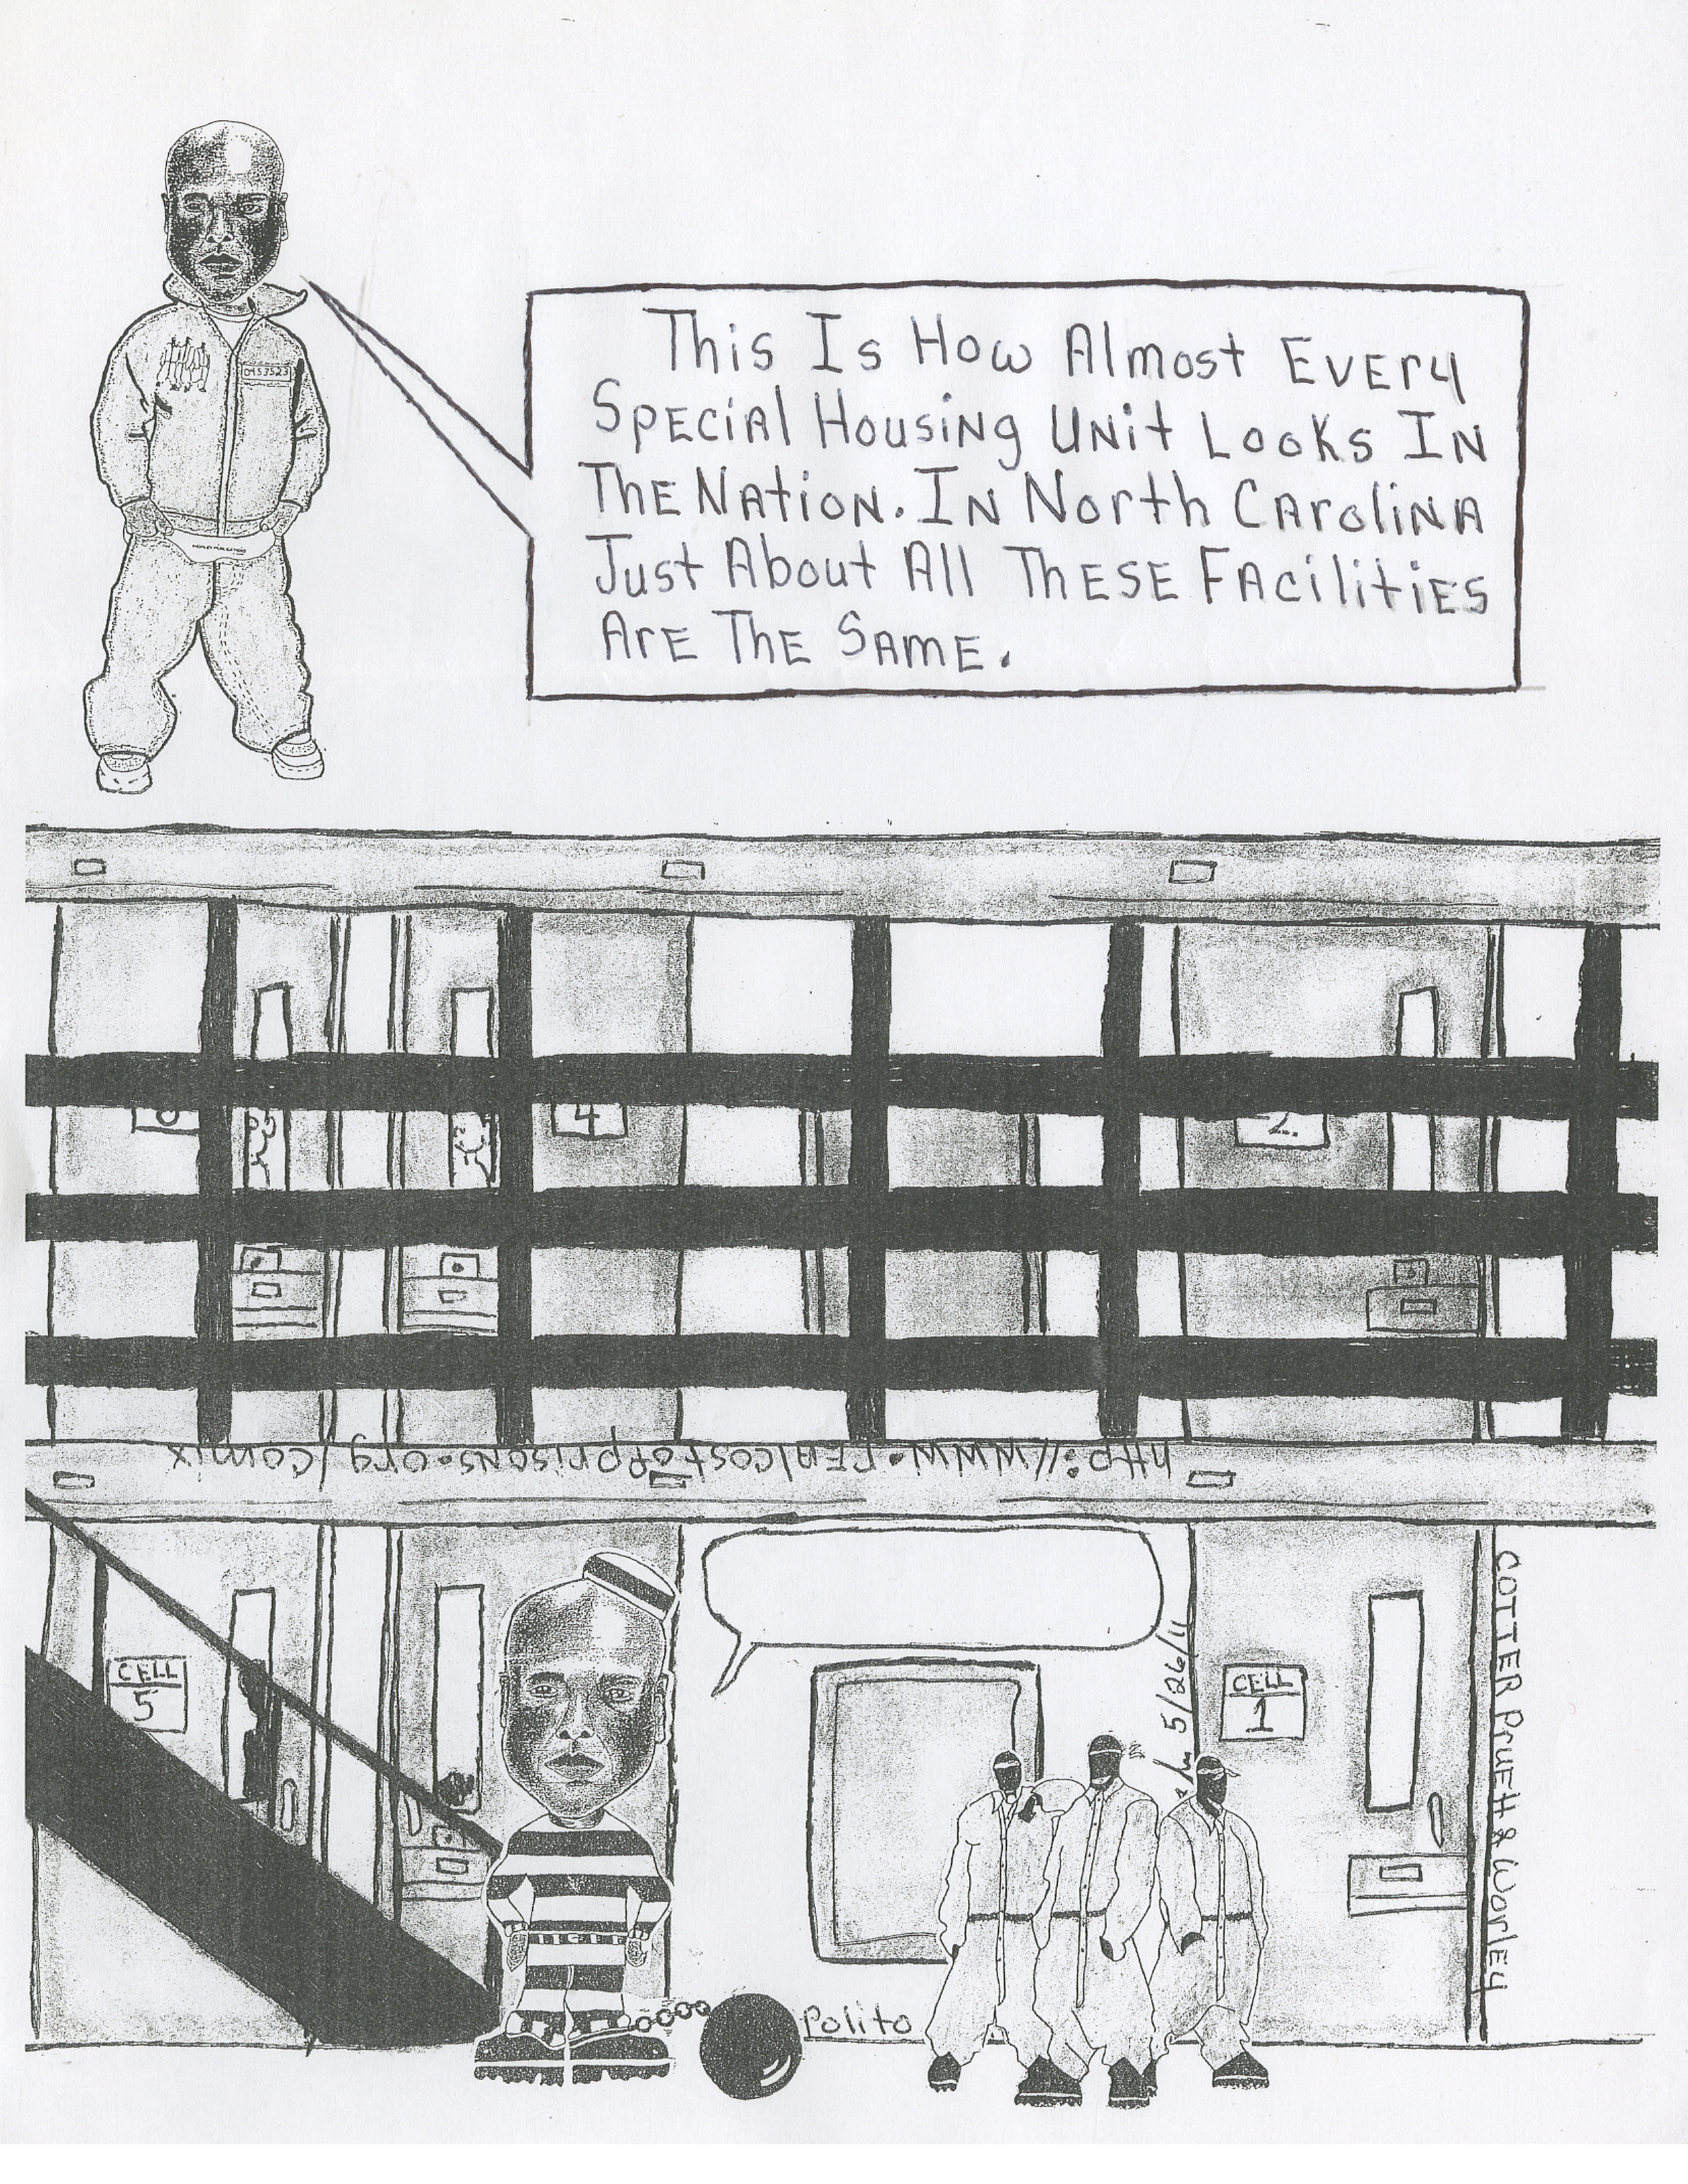 Willie Worley, Jr. Brown Creek Correctional Institute in Polkton, NC